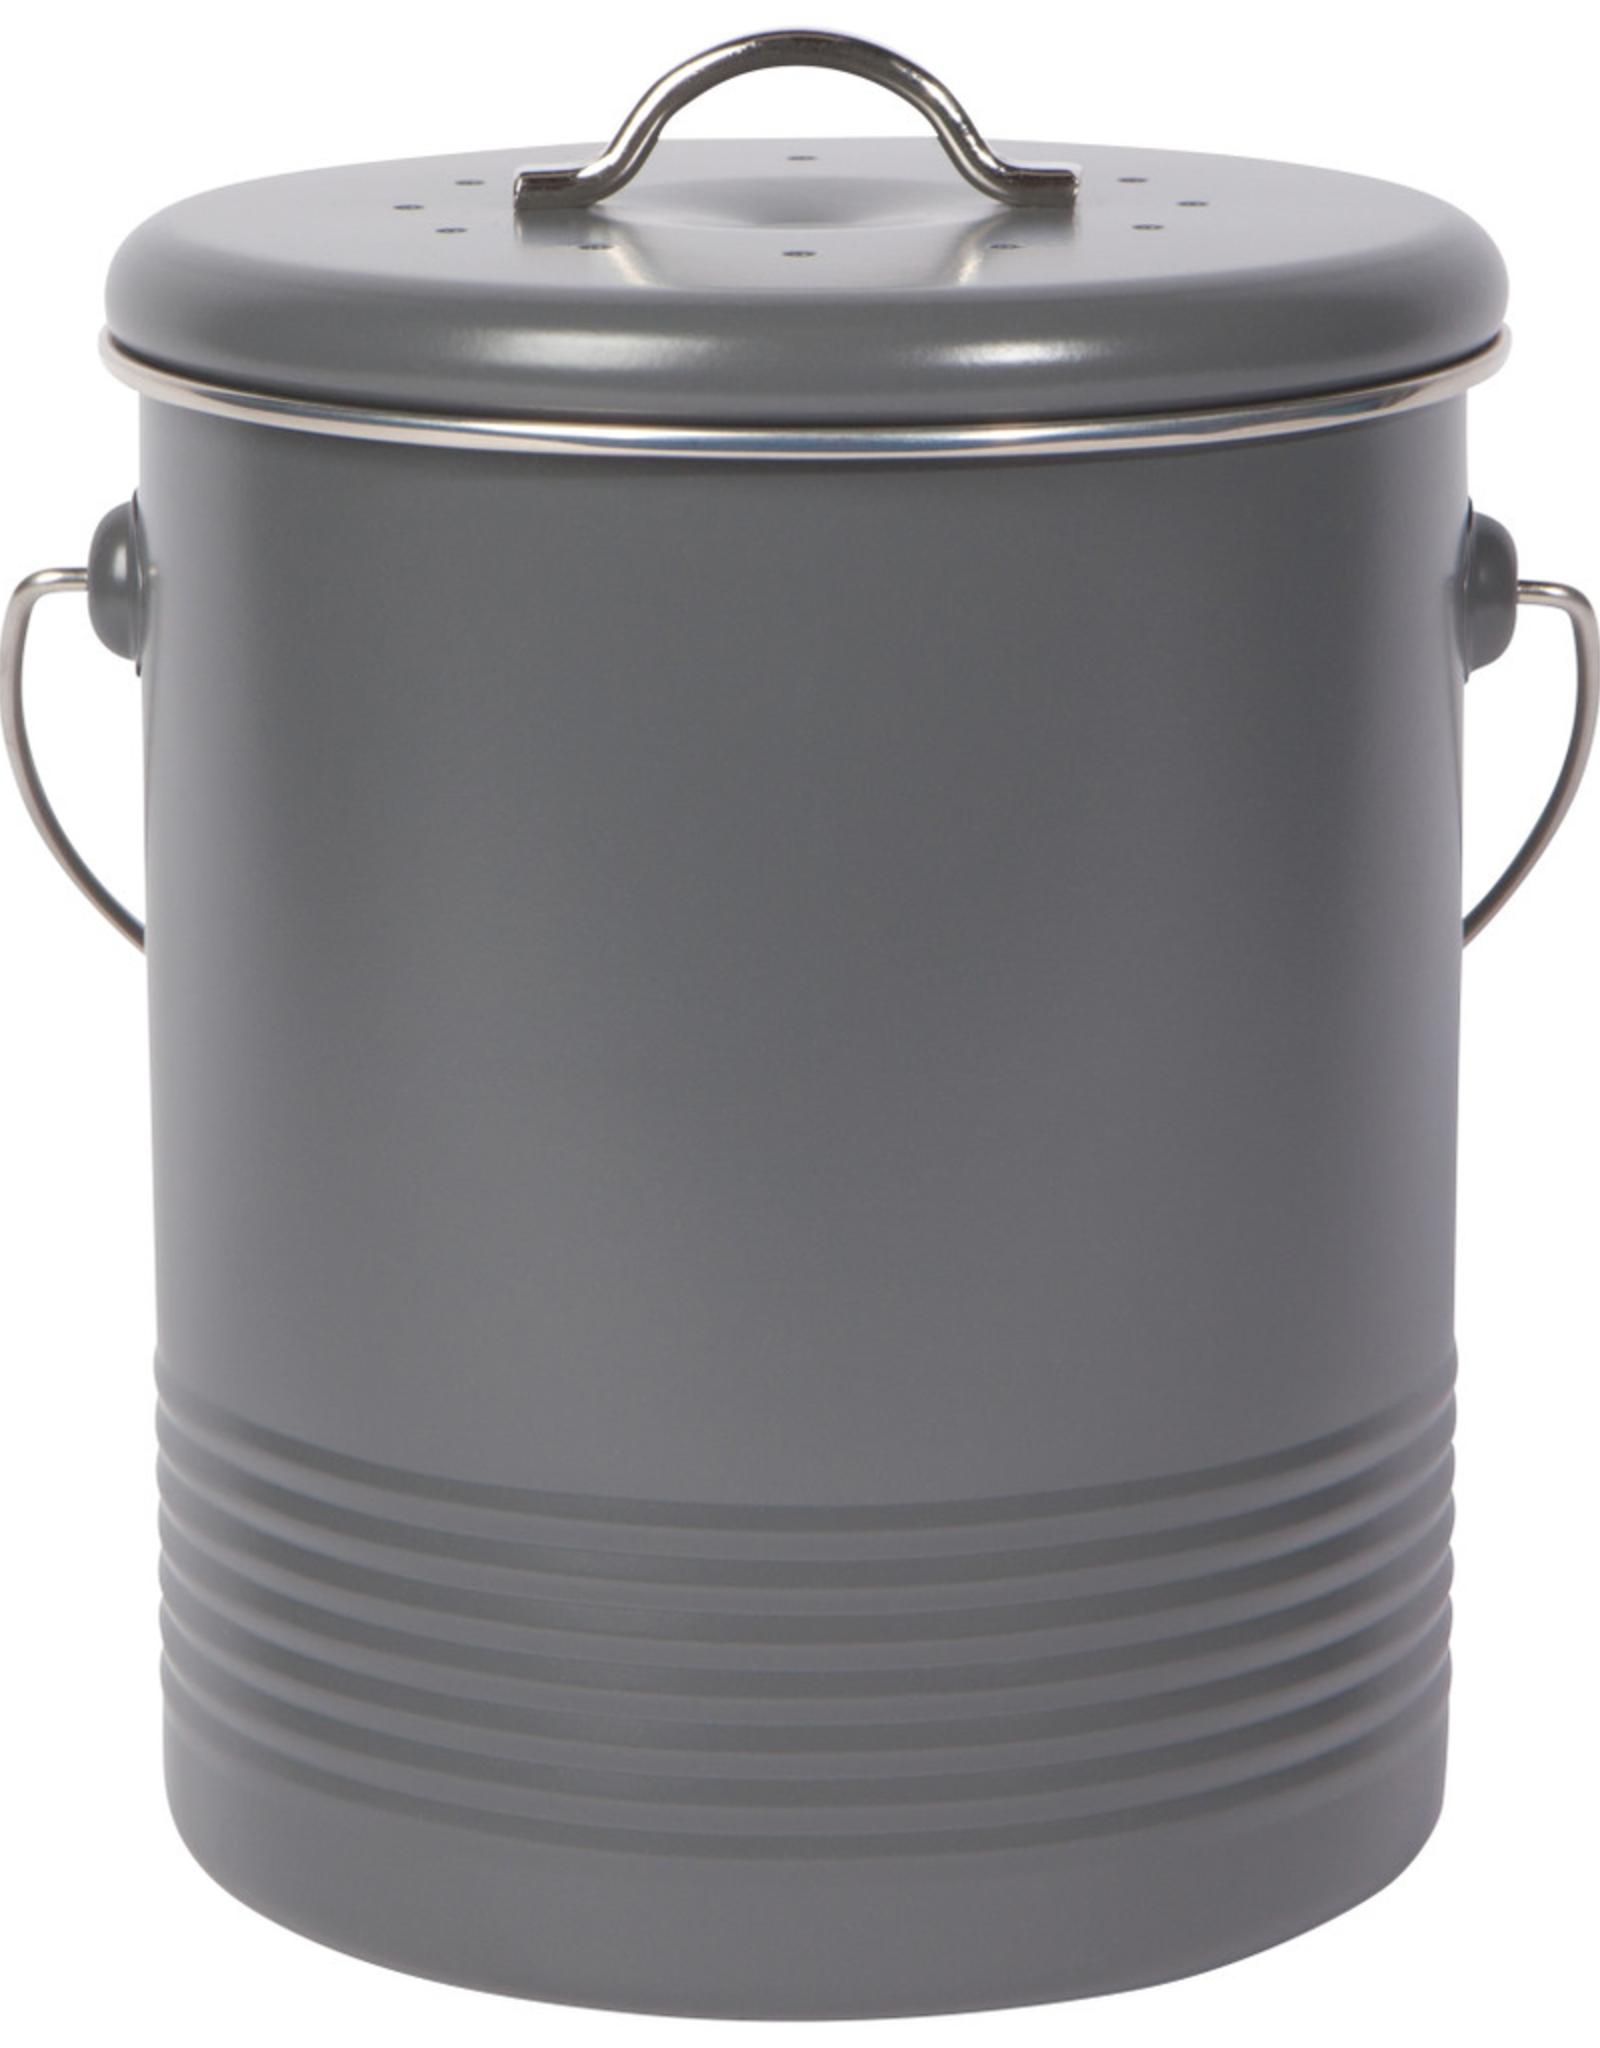 Danica Danica Compost Bin-Charcoal